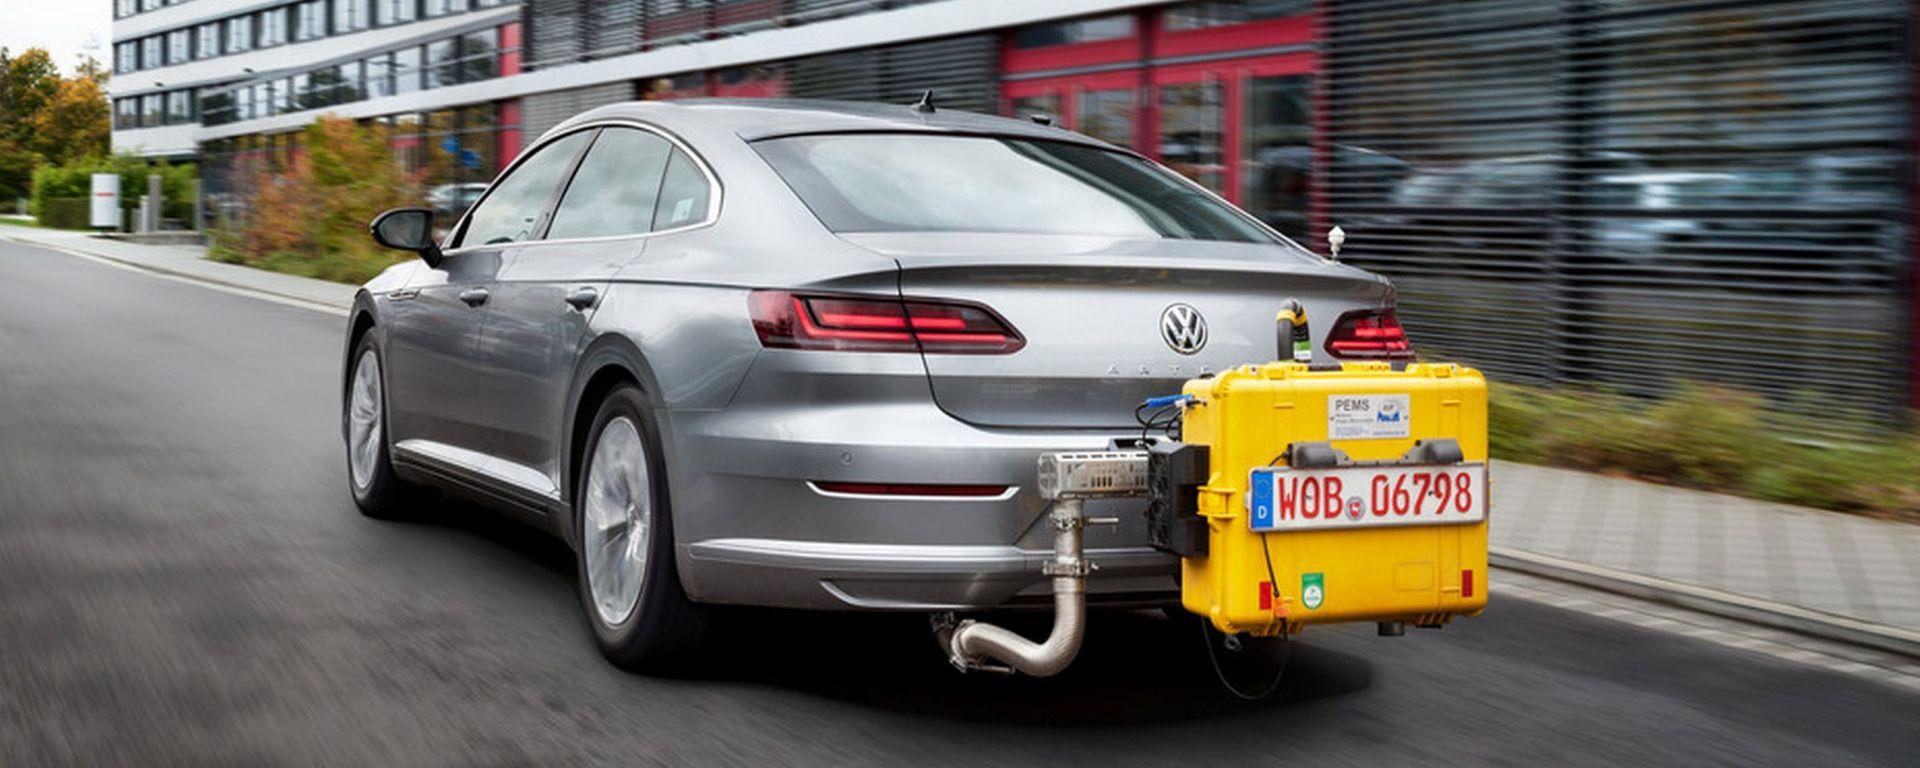 Volkswagen: ecco cosa cambia con le nuove regole WLTP